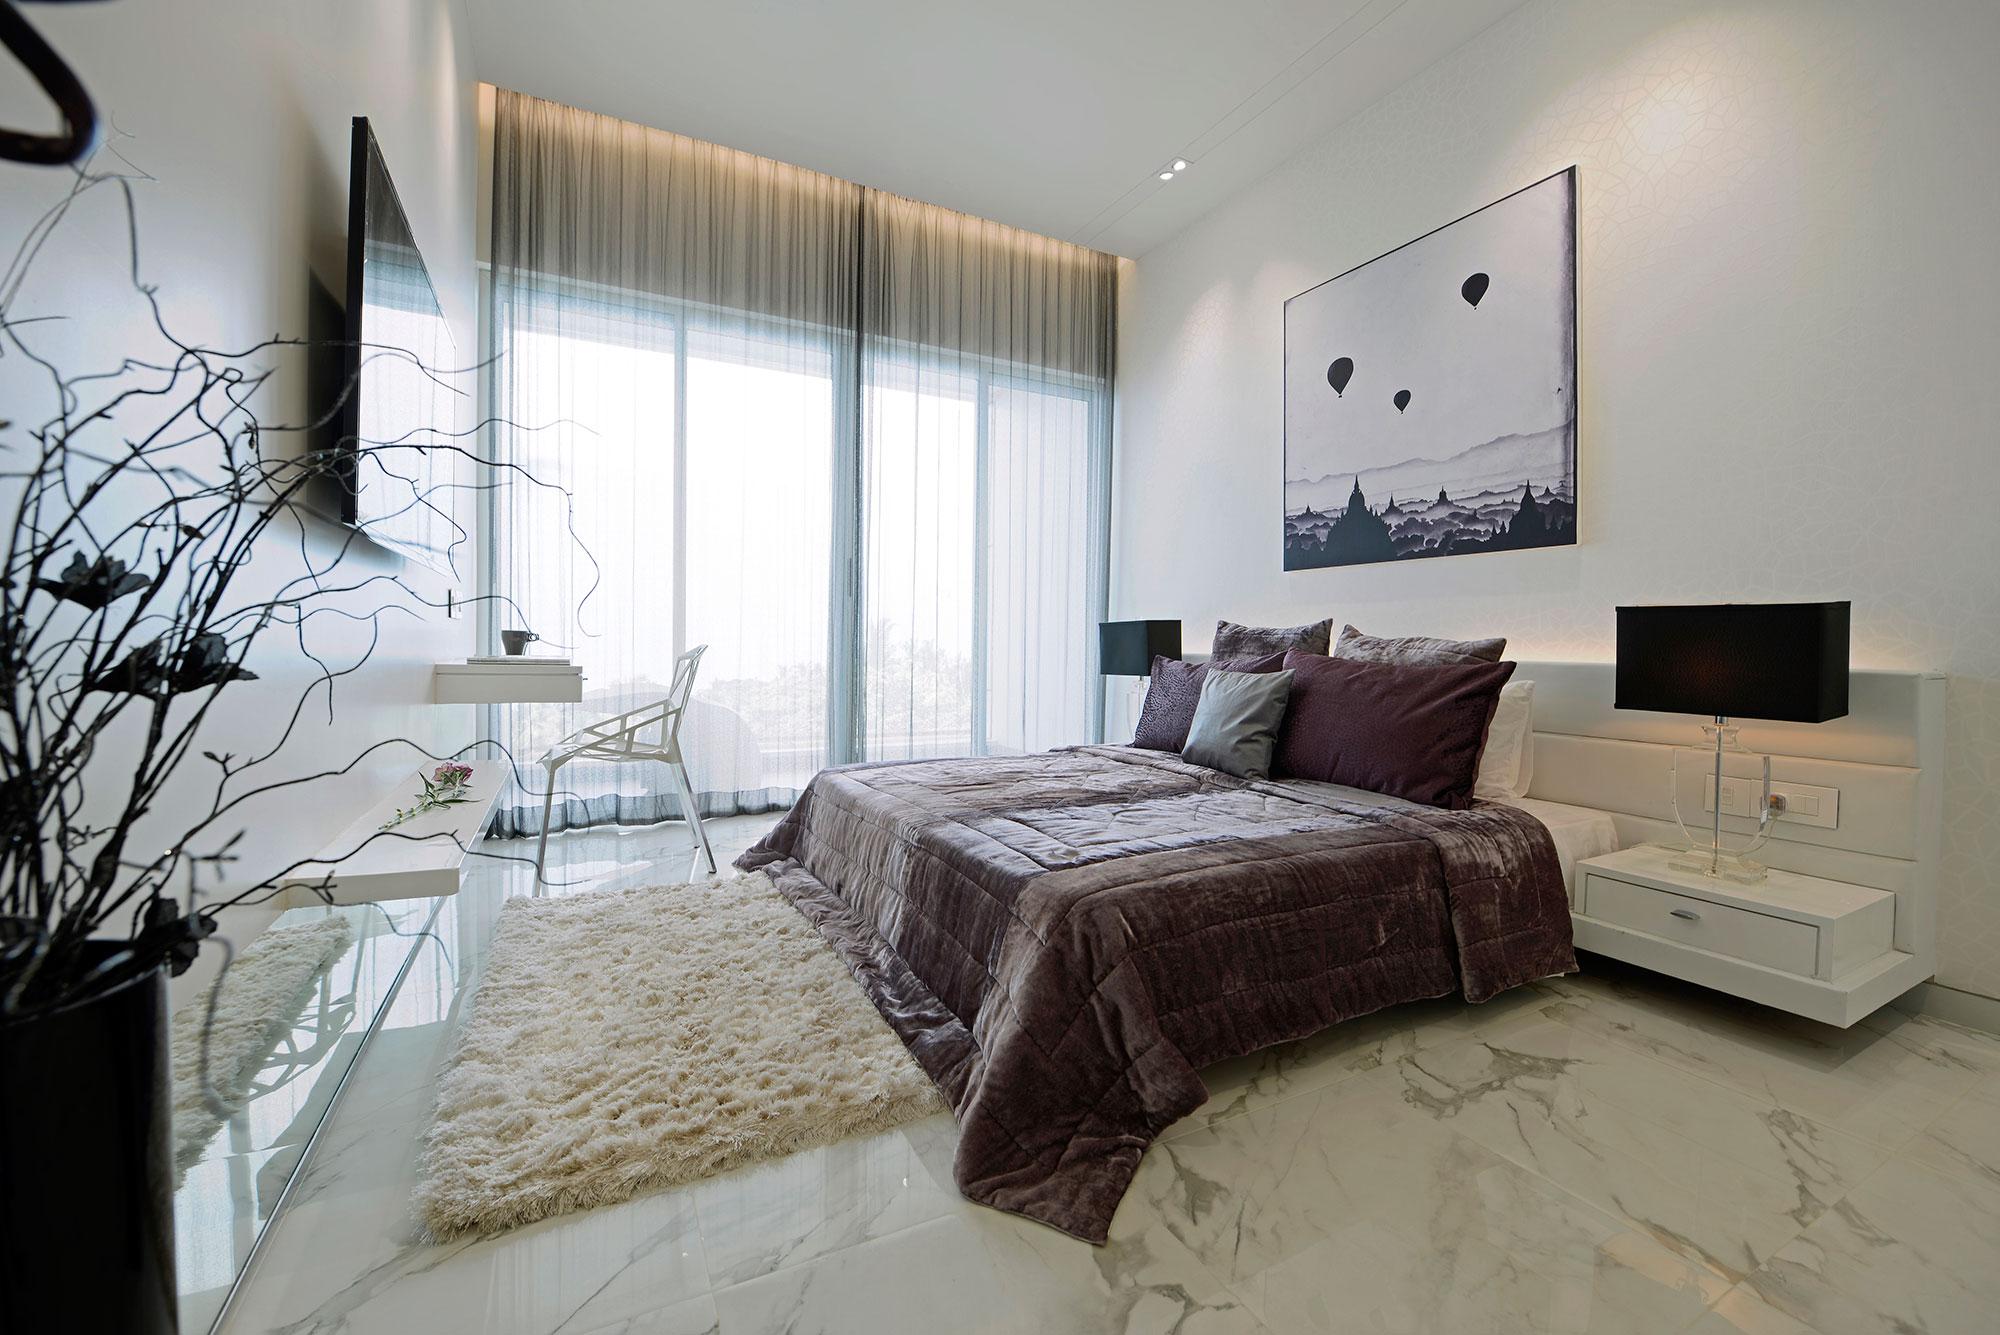 Luxurious Apartment By Ga Design In Mumbai India Homedezen